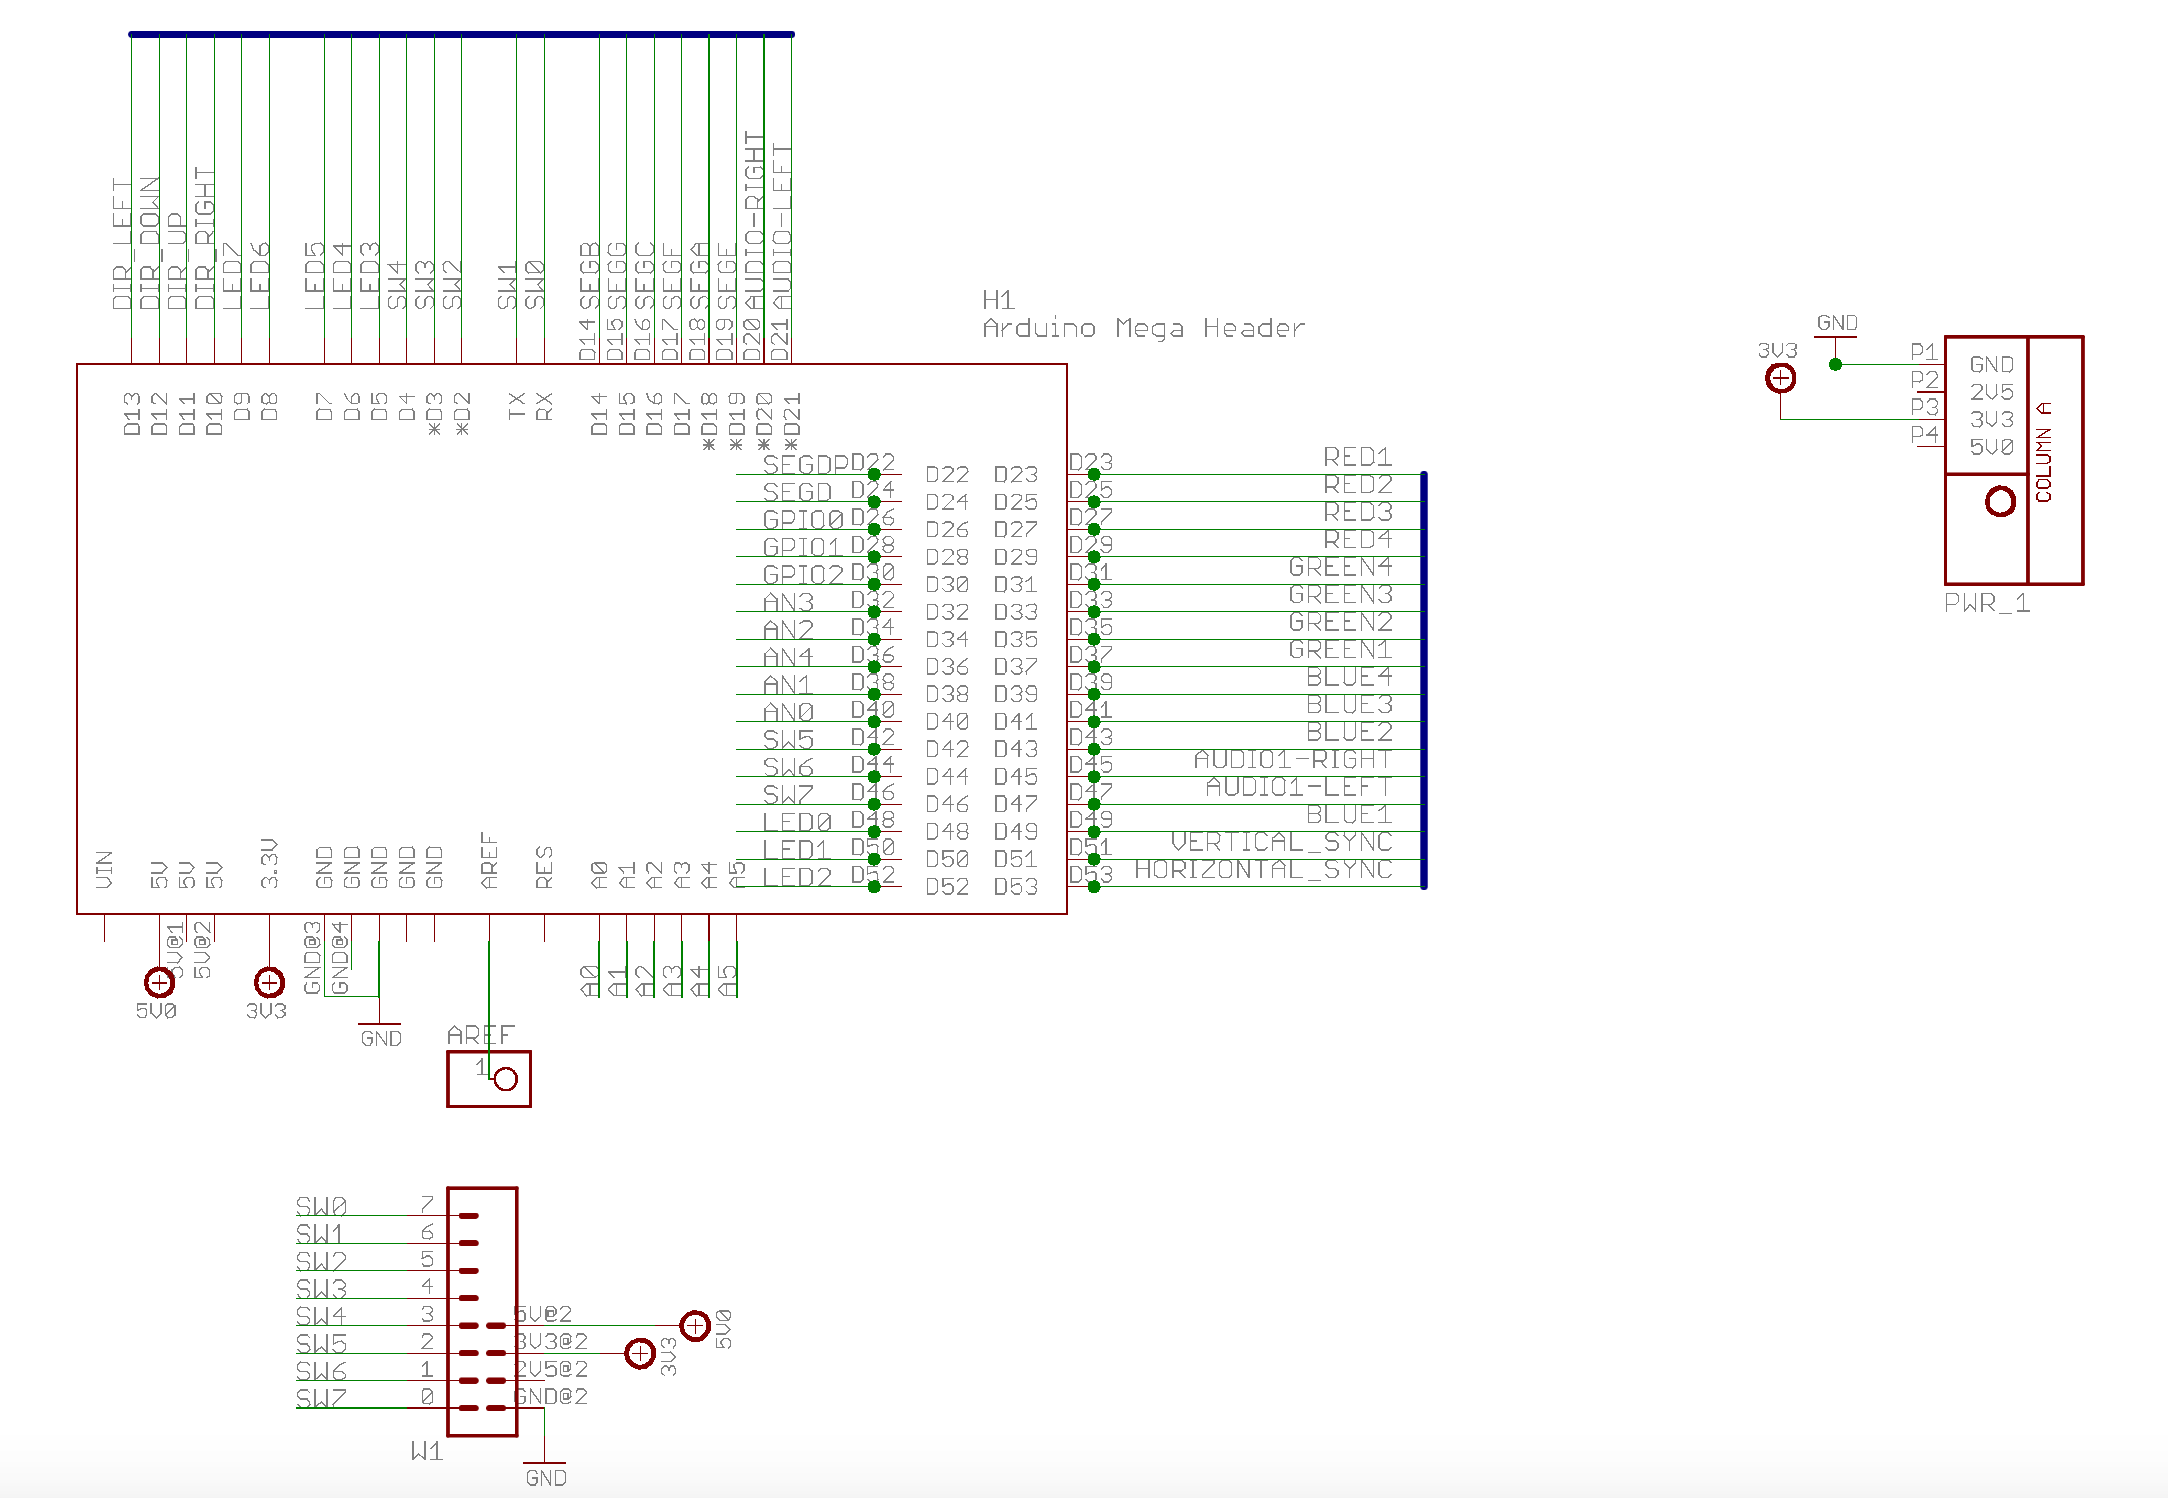 Logicstartshield 7 Segment Logic Diagram Click The Image To Load A High Resolution Of Logicstart Shield